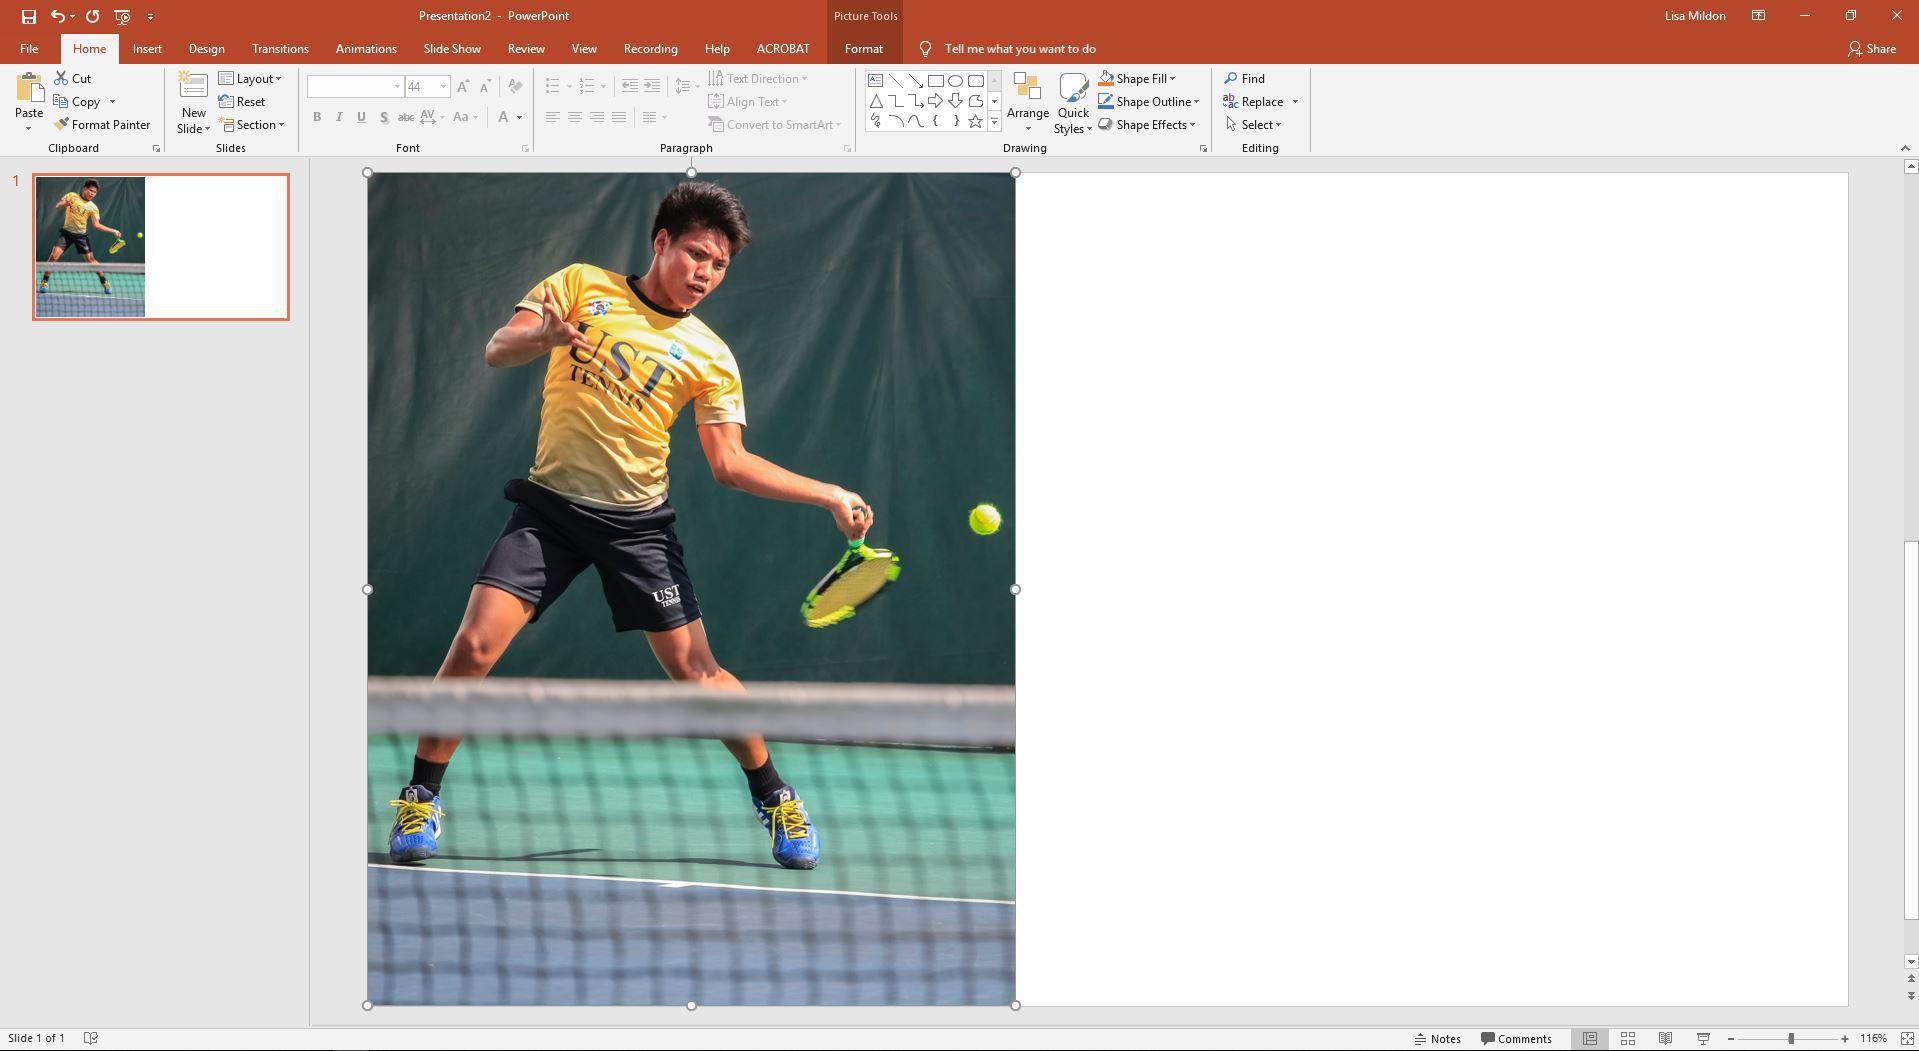 PowerPoint slide showing a tennis player hitting a ball.